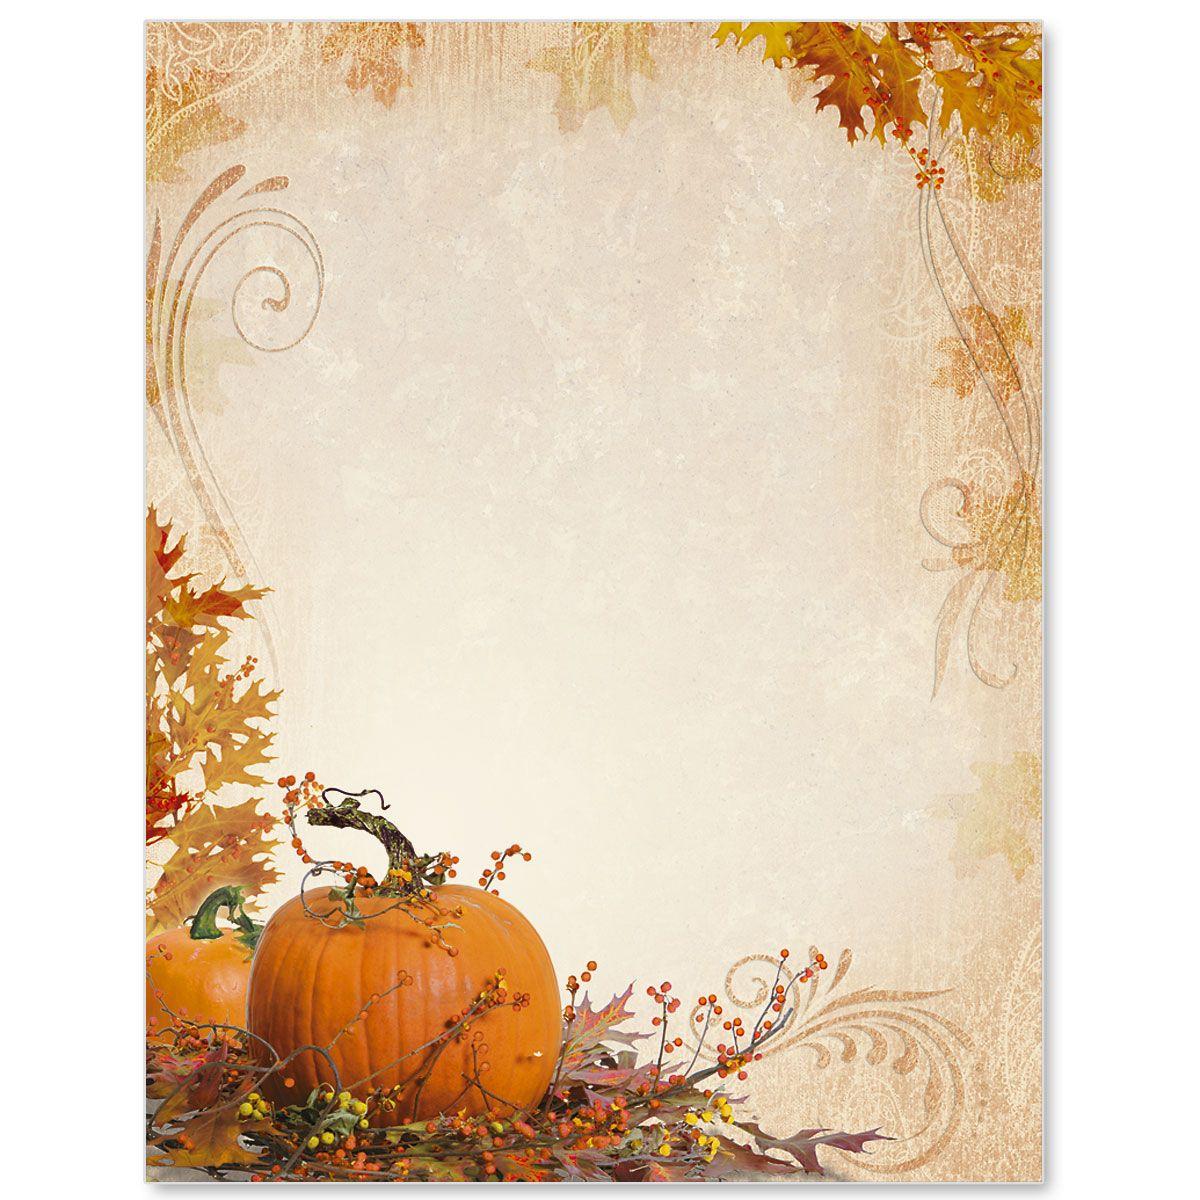 Splendid Autumn Border Papers | Autumm | Pinterest | Borders For - Free Printable Autumn Paper